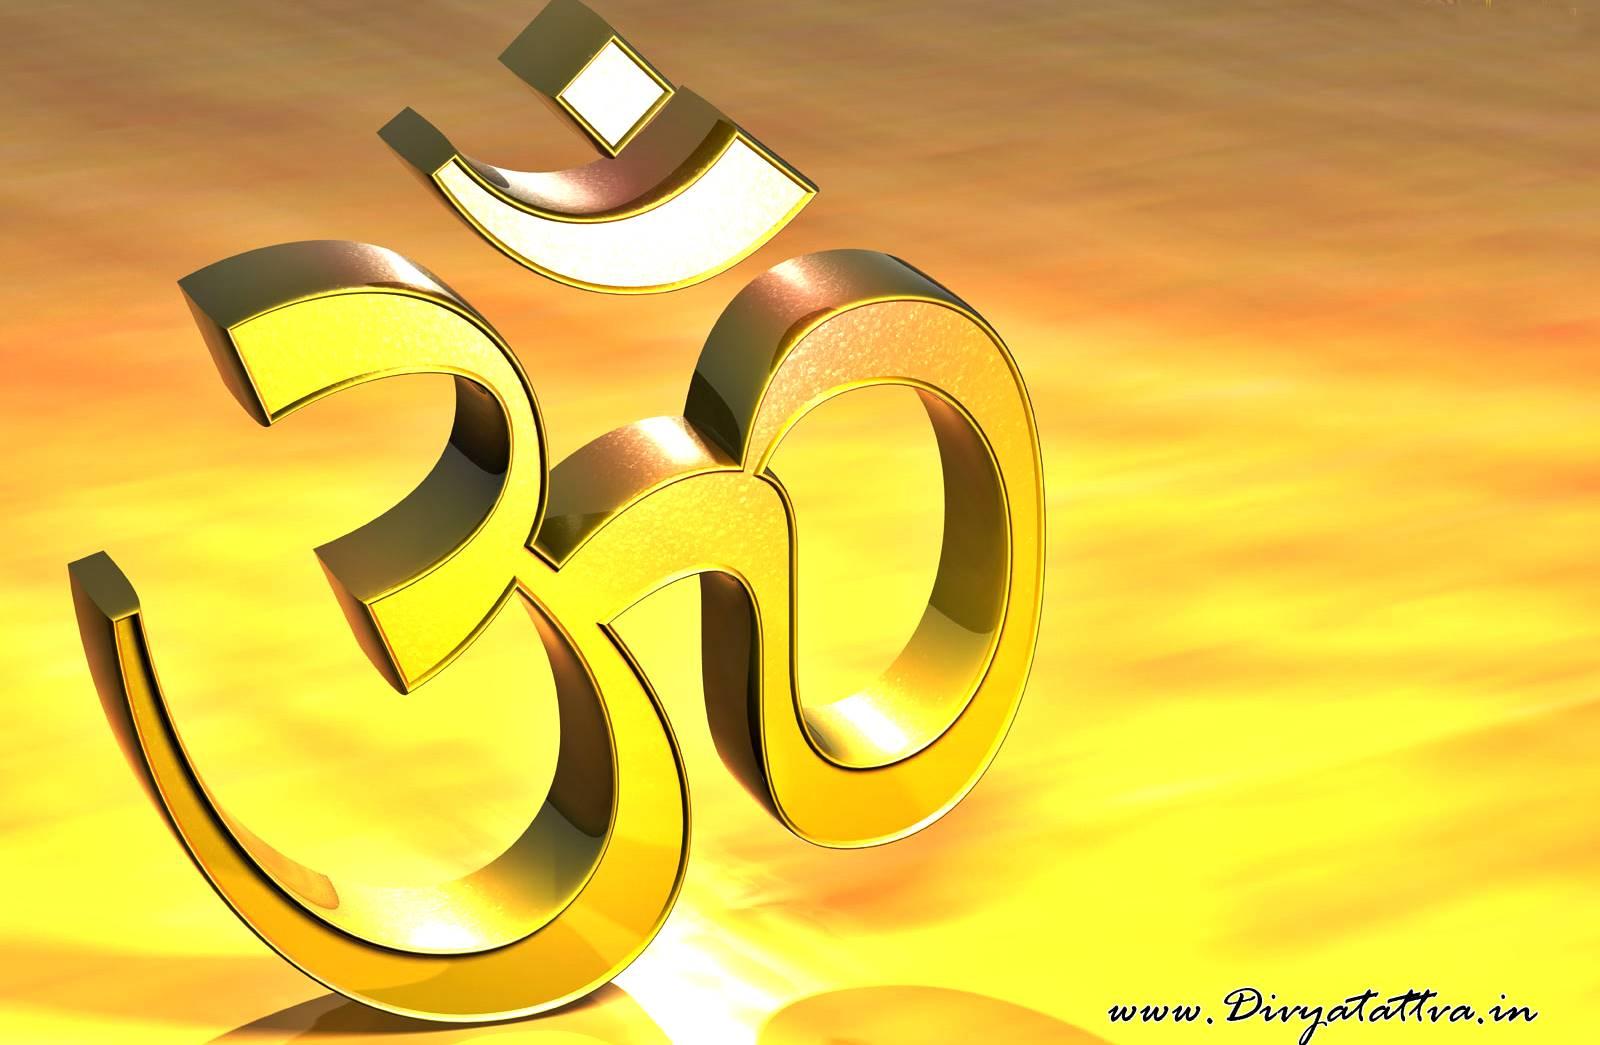 Top Wallpaper Name Divya - om-wallpaper-hd-3d-background-photos-divyatattva  HD_56249.jpg